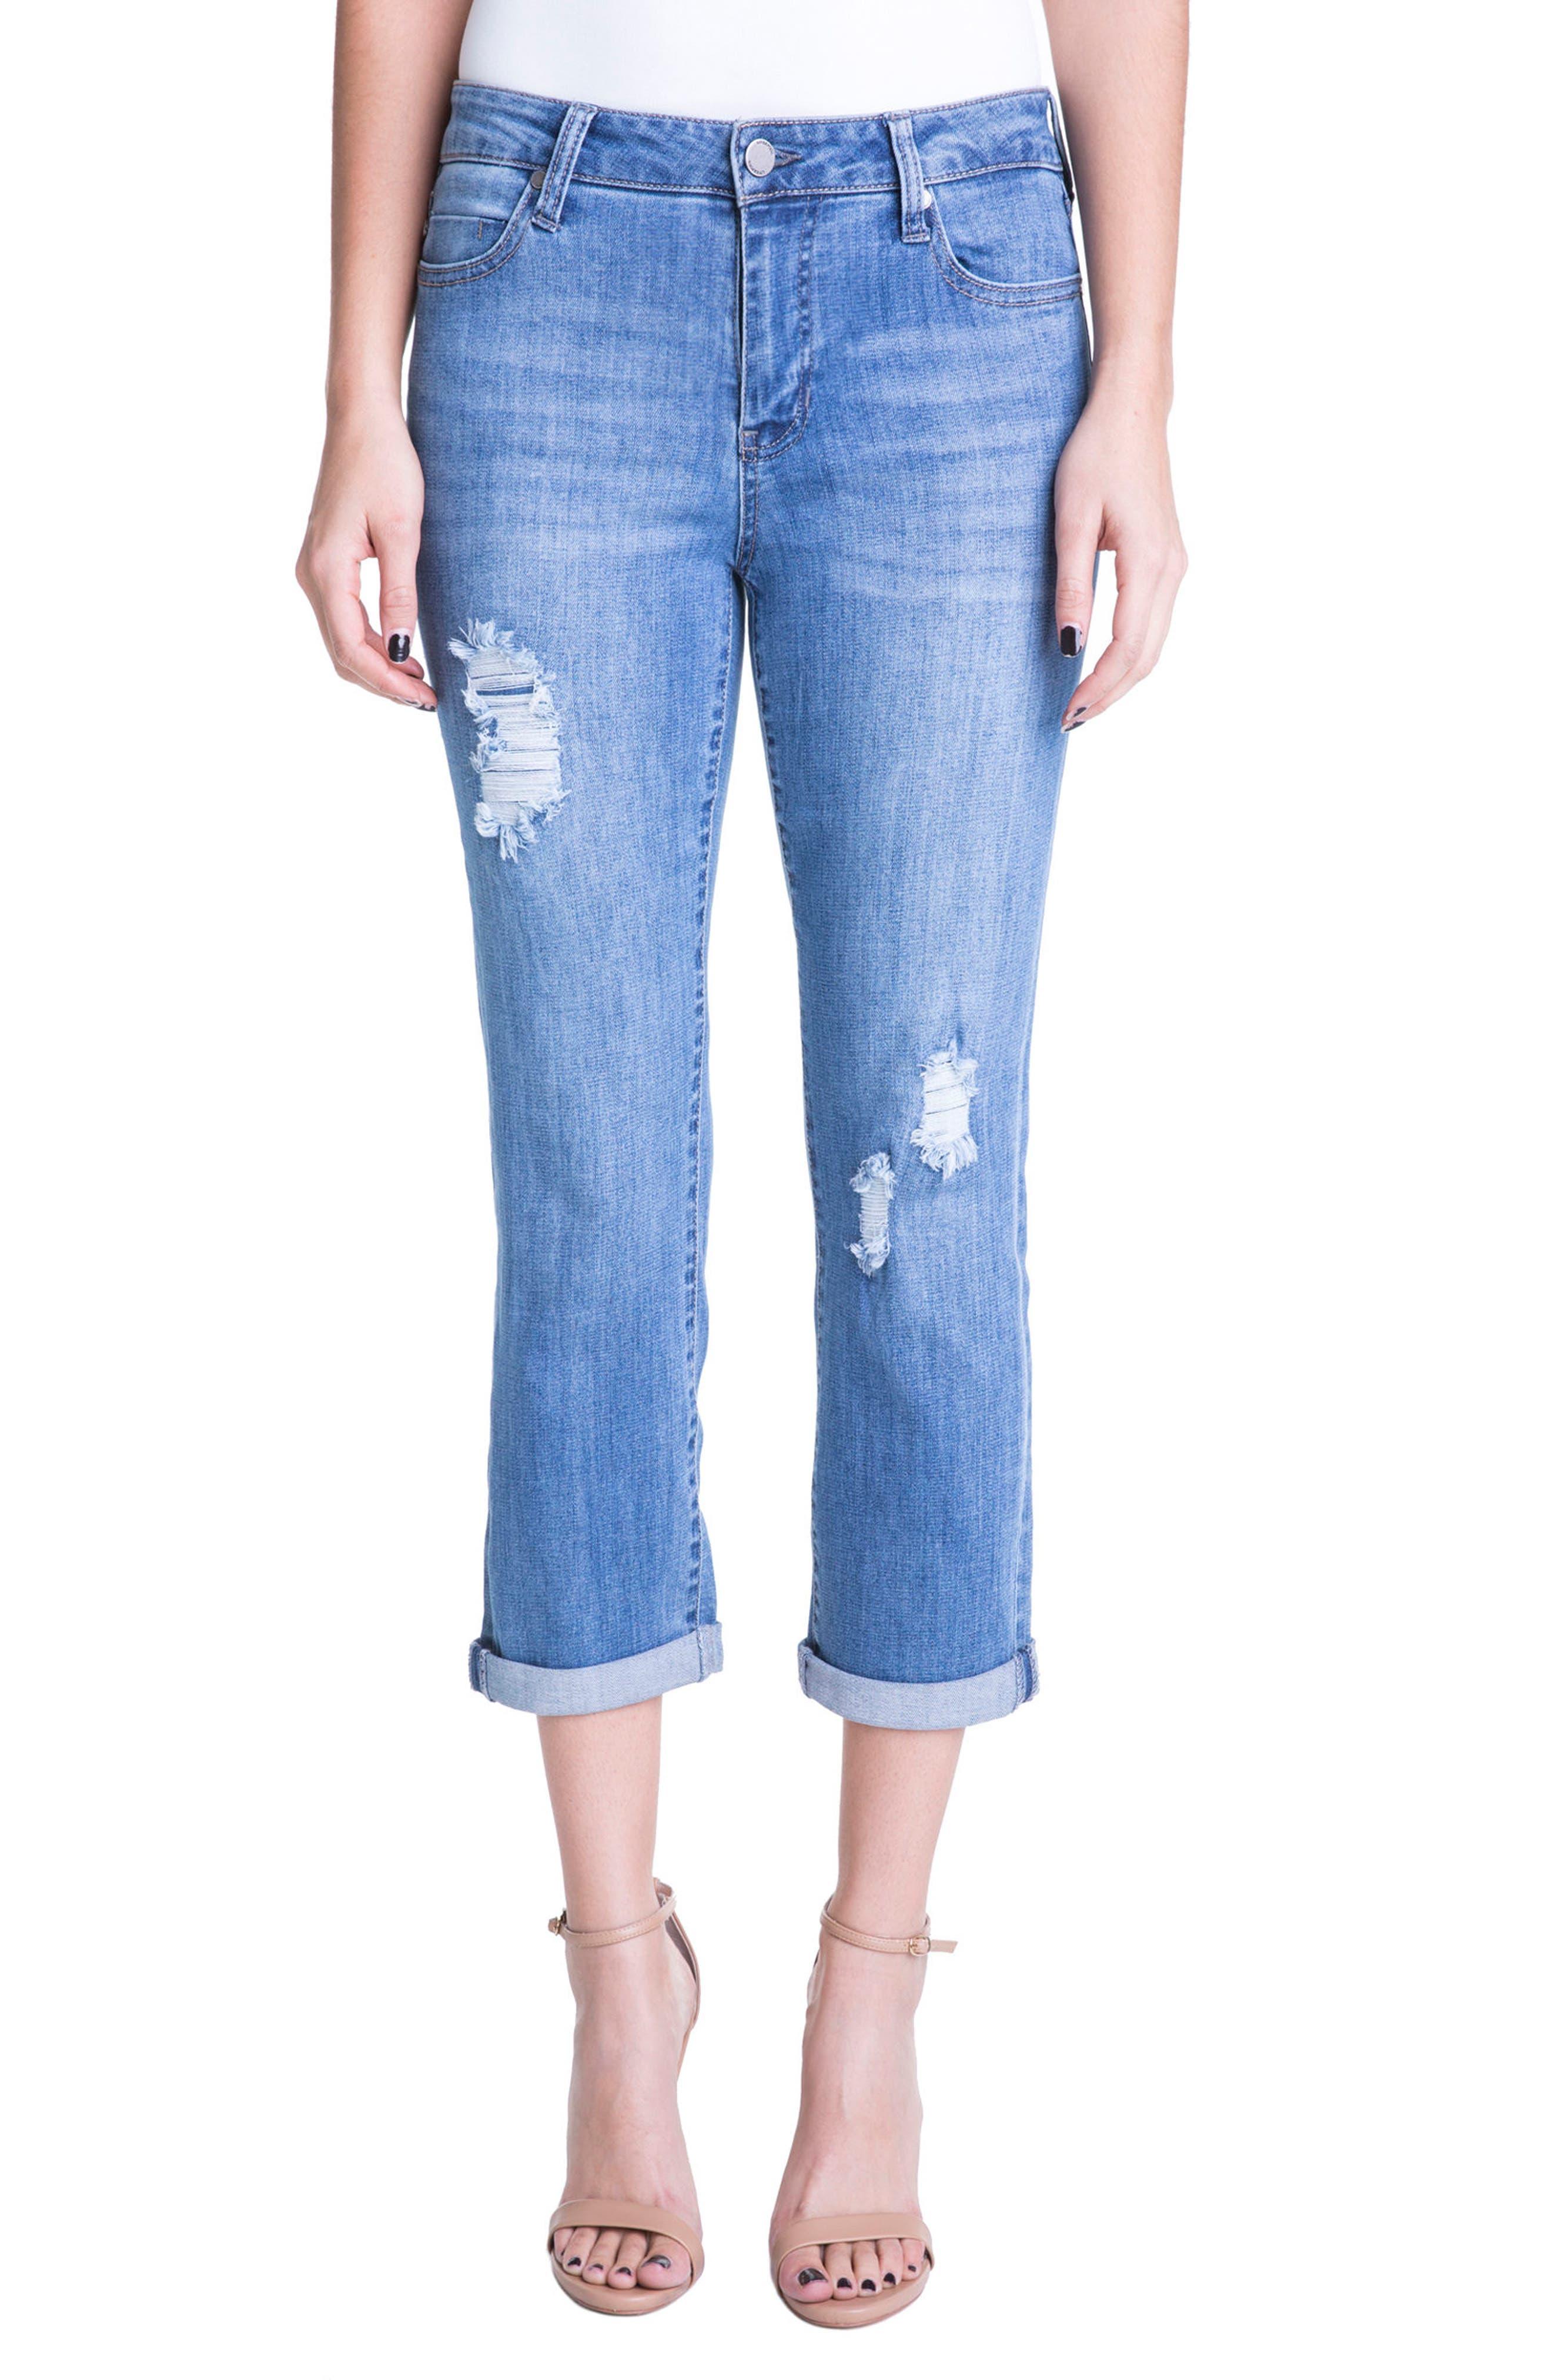 Liverpool Jeans Company Michelle Distressed Cuff Capri Jeans (Melbourne Light Destruction)